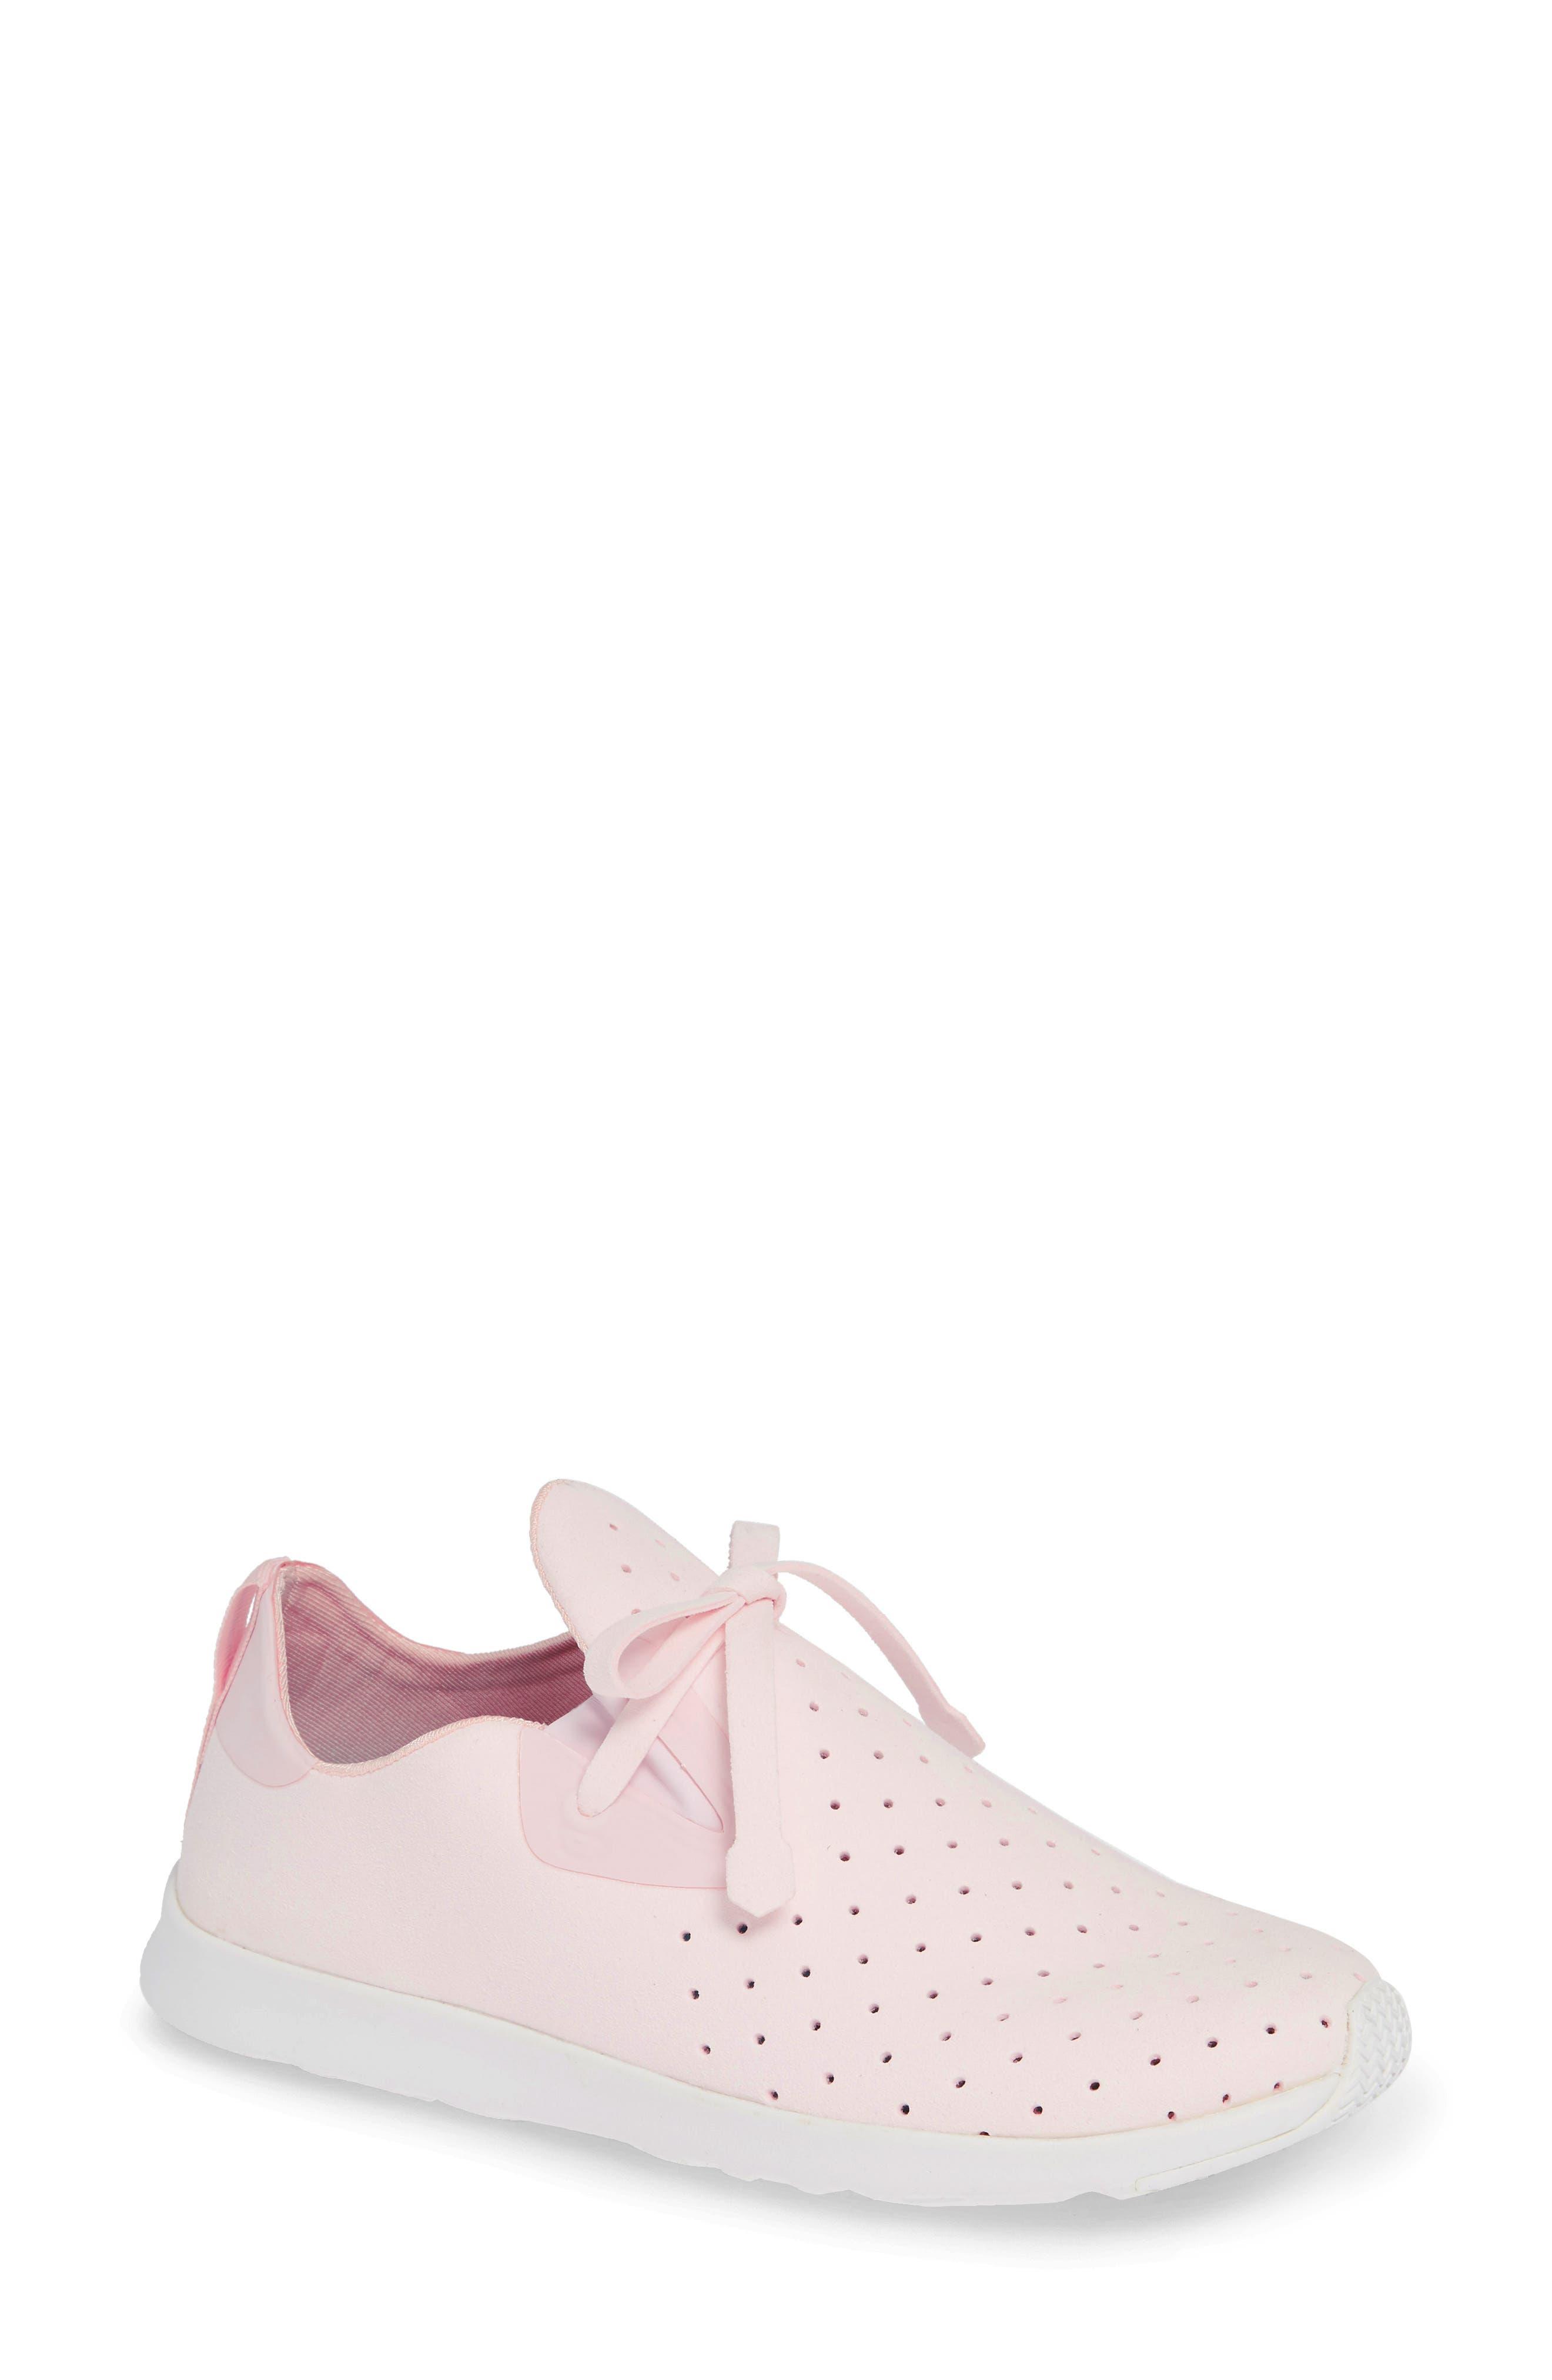 'Apollo' Perforated Sneaker, Main, color, 650